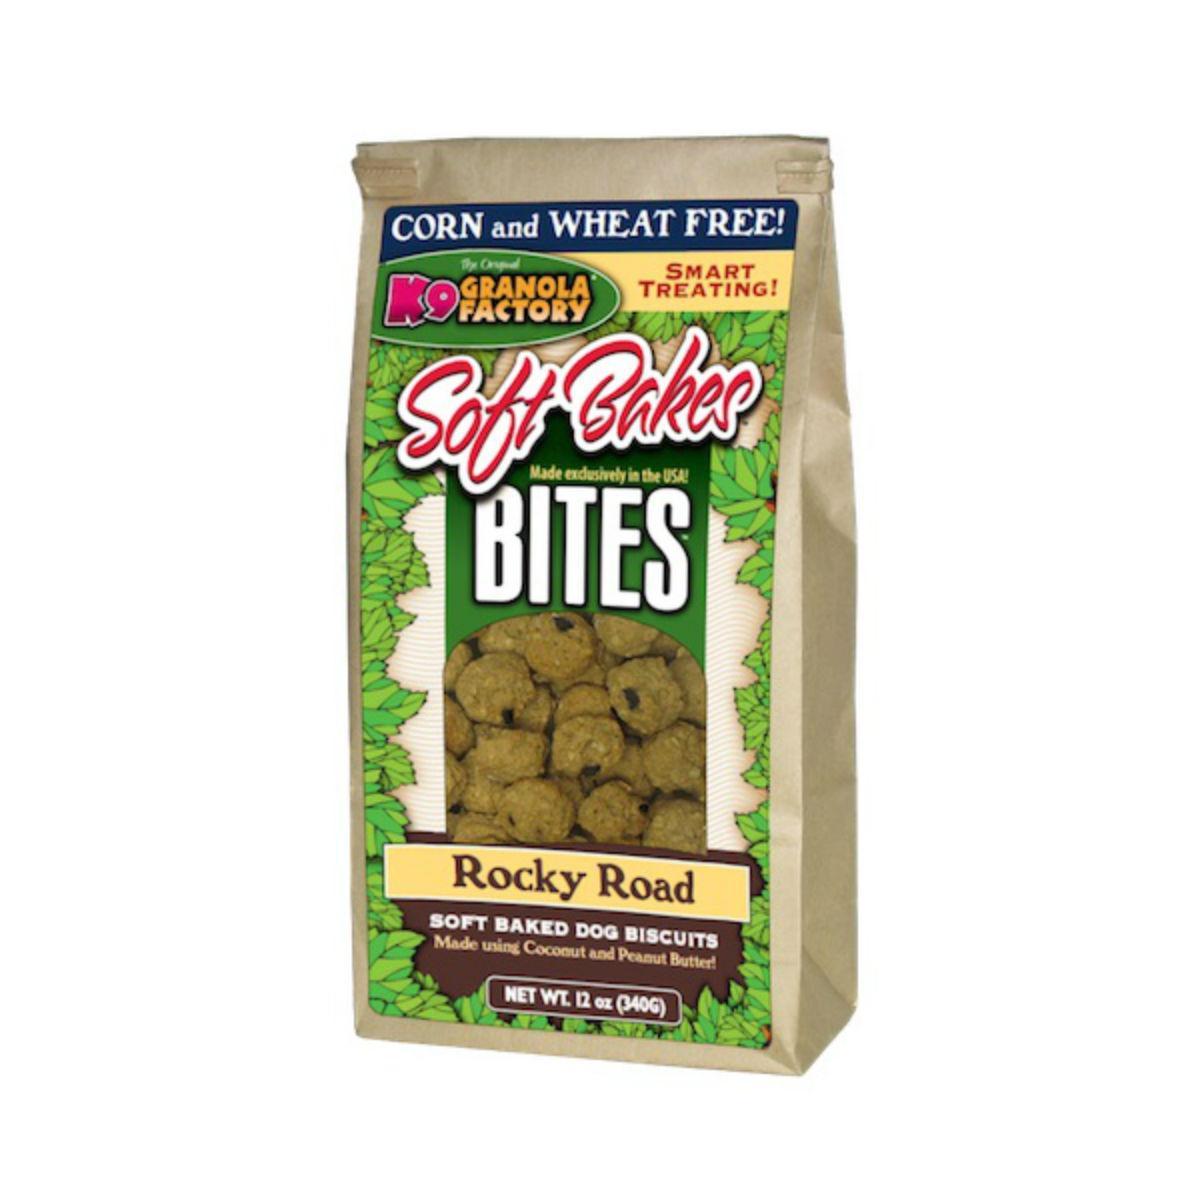 K9 Granola Factory Soft Bakes Bites Dog Treat - Rocky Road w/ Coconut & Peanut Butter Granola